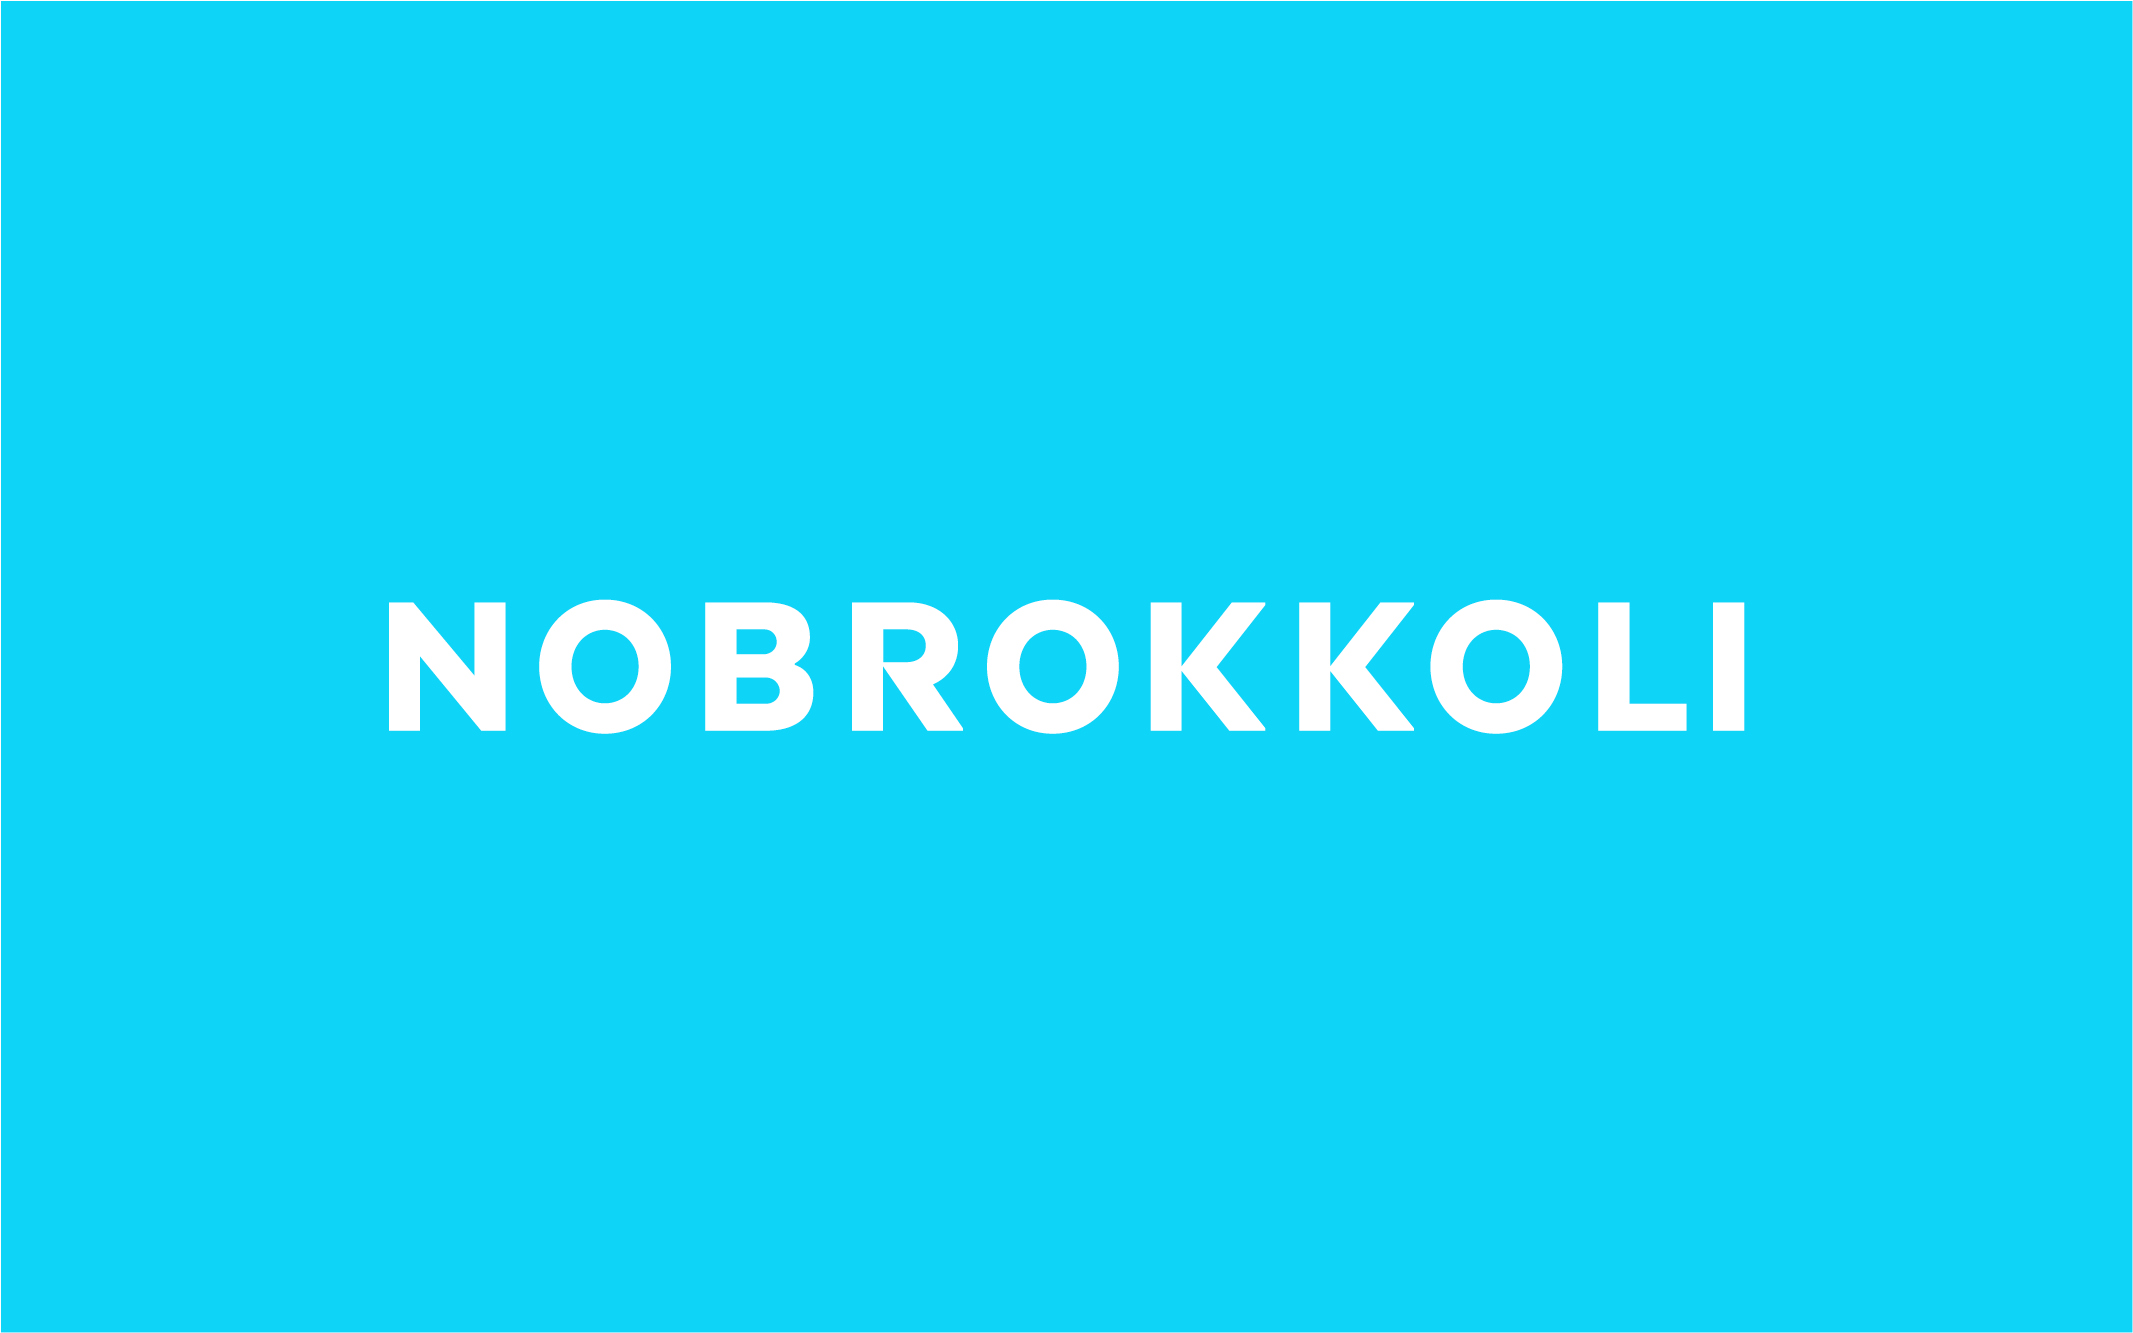 Nobrokkoli – Poarangan Brand Design !11